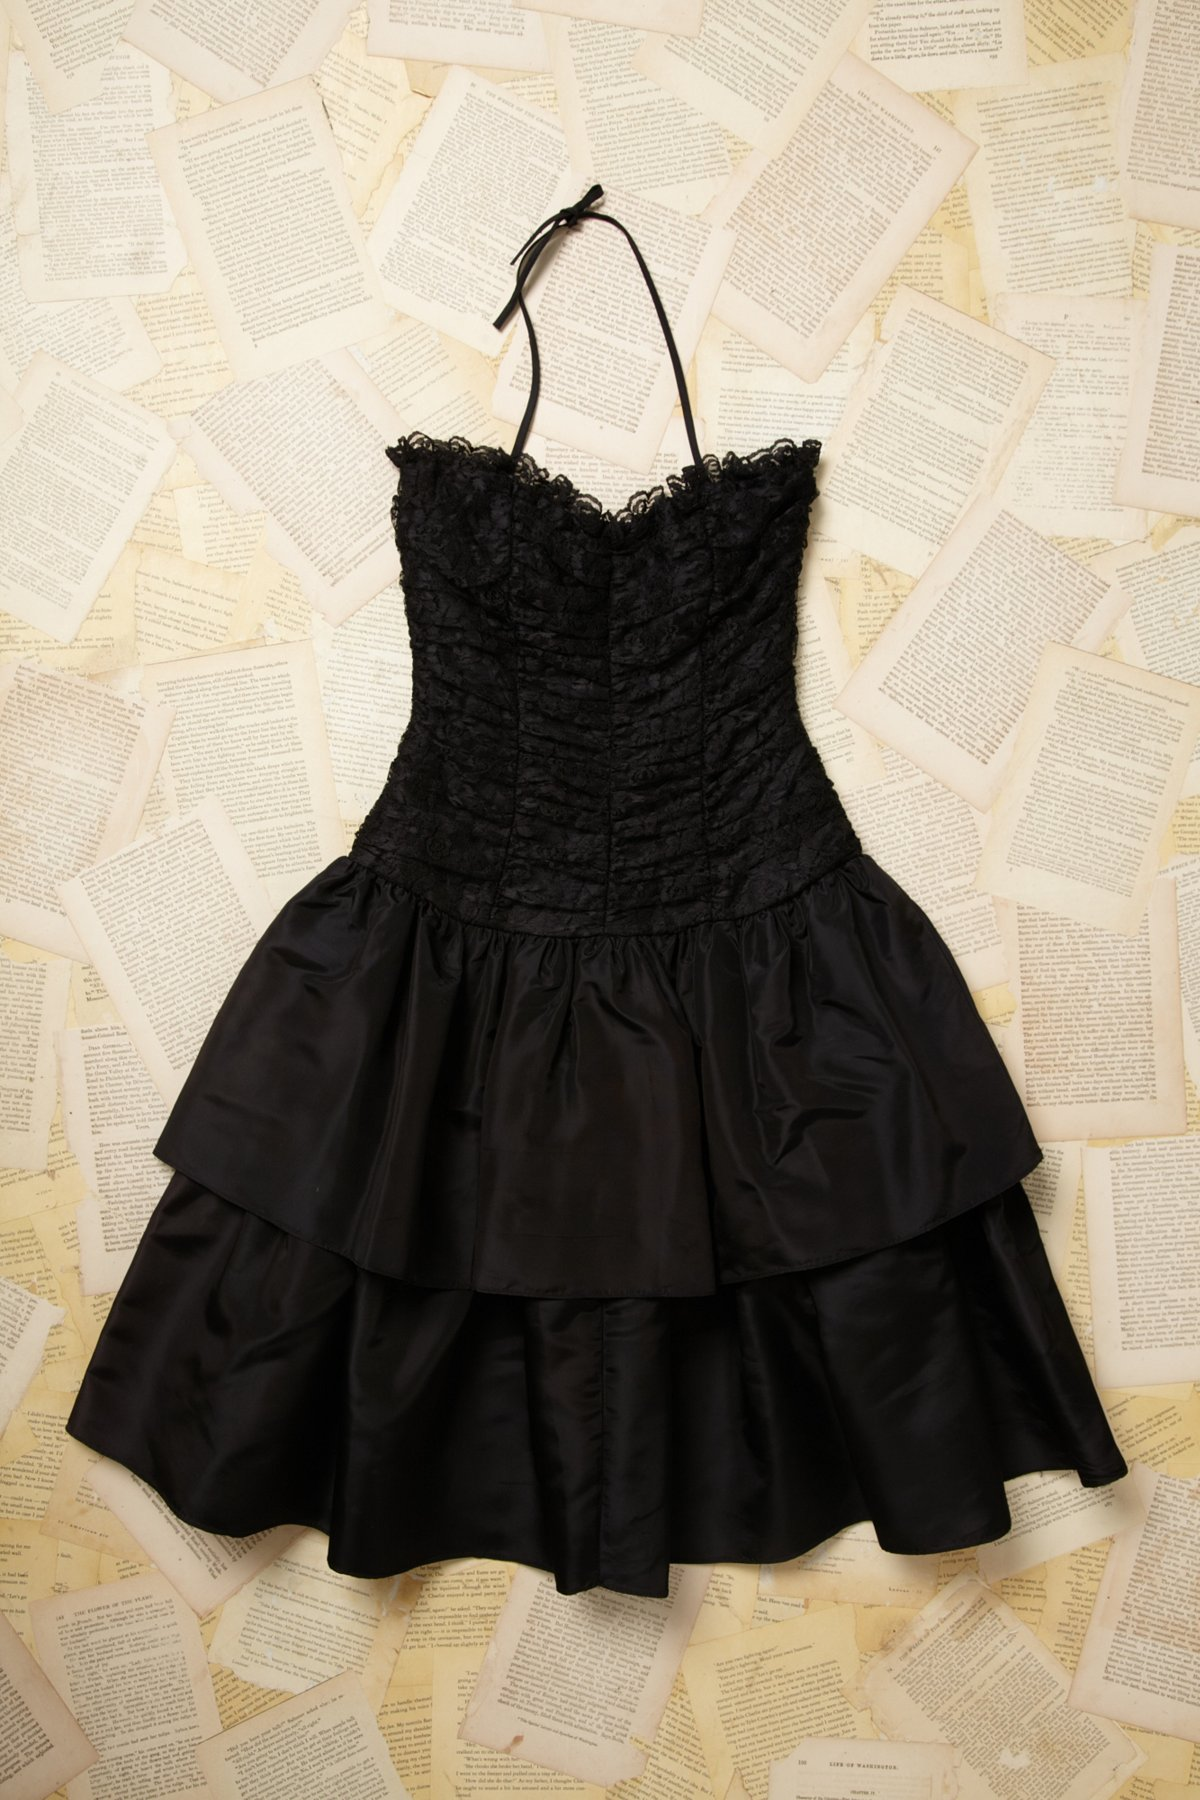 Vintage Lace Strapless Ruffle Dress